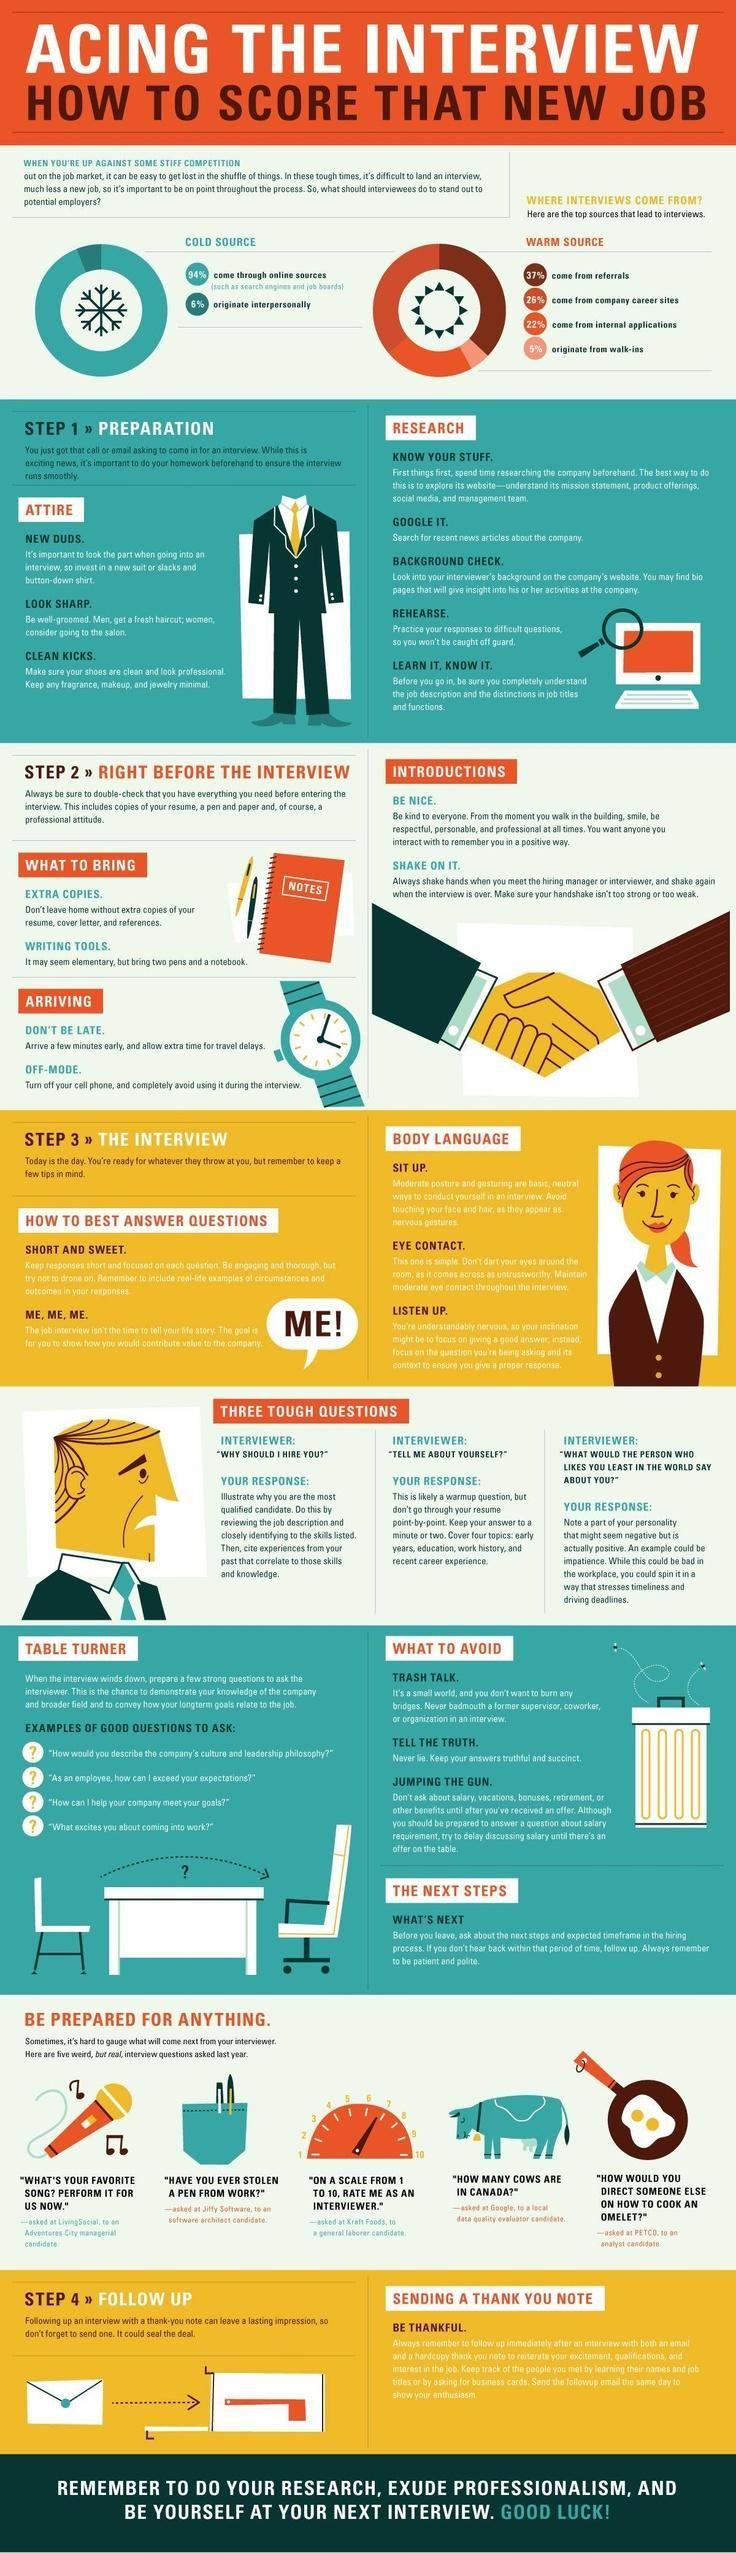 top #interview #tips